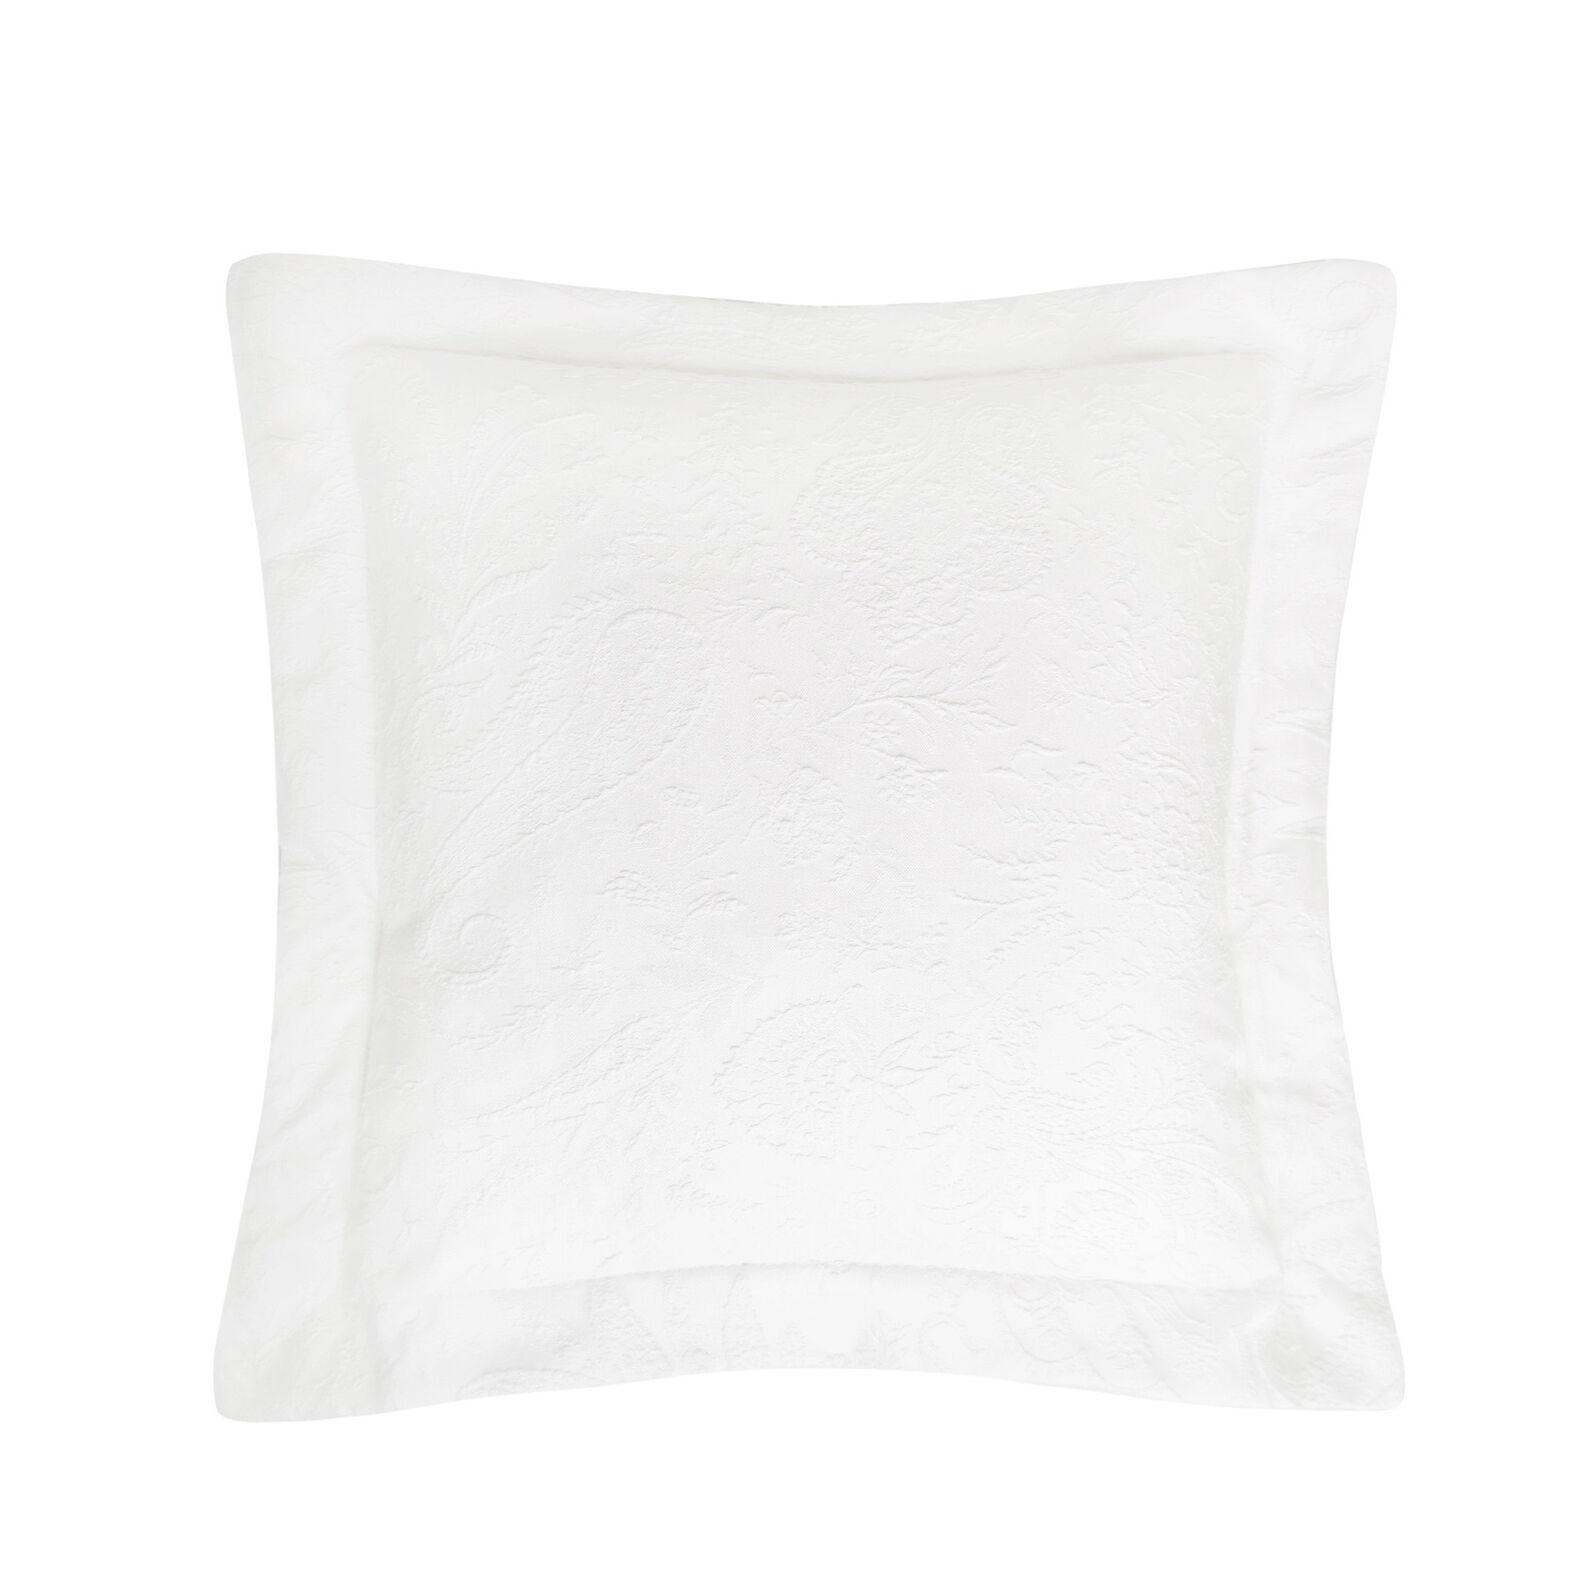 Portofino paisley patterned cushion